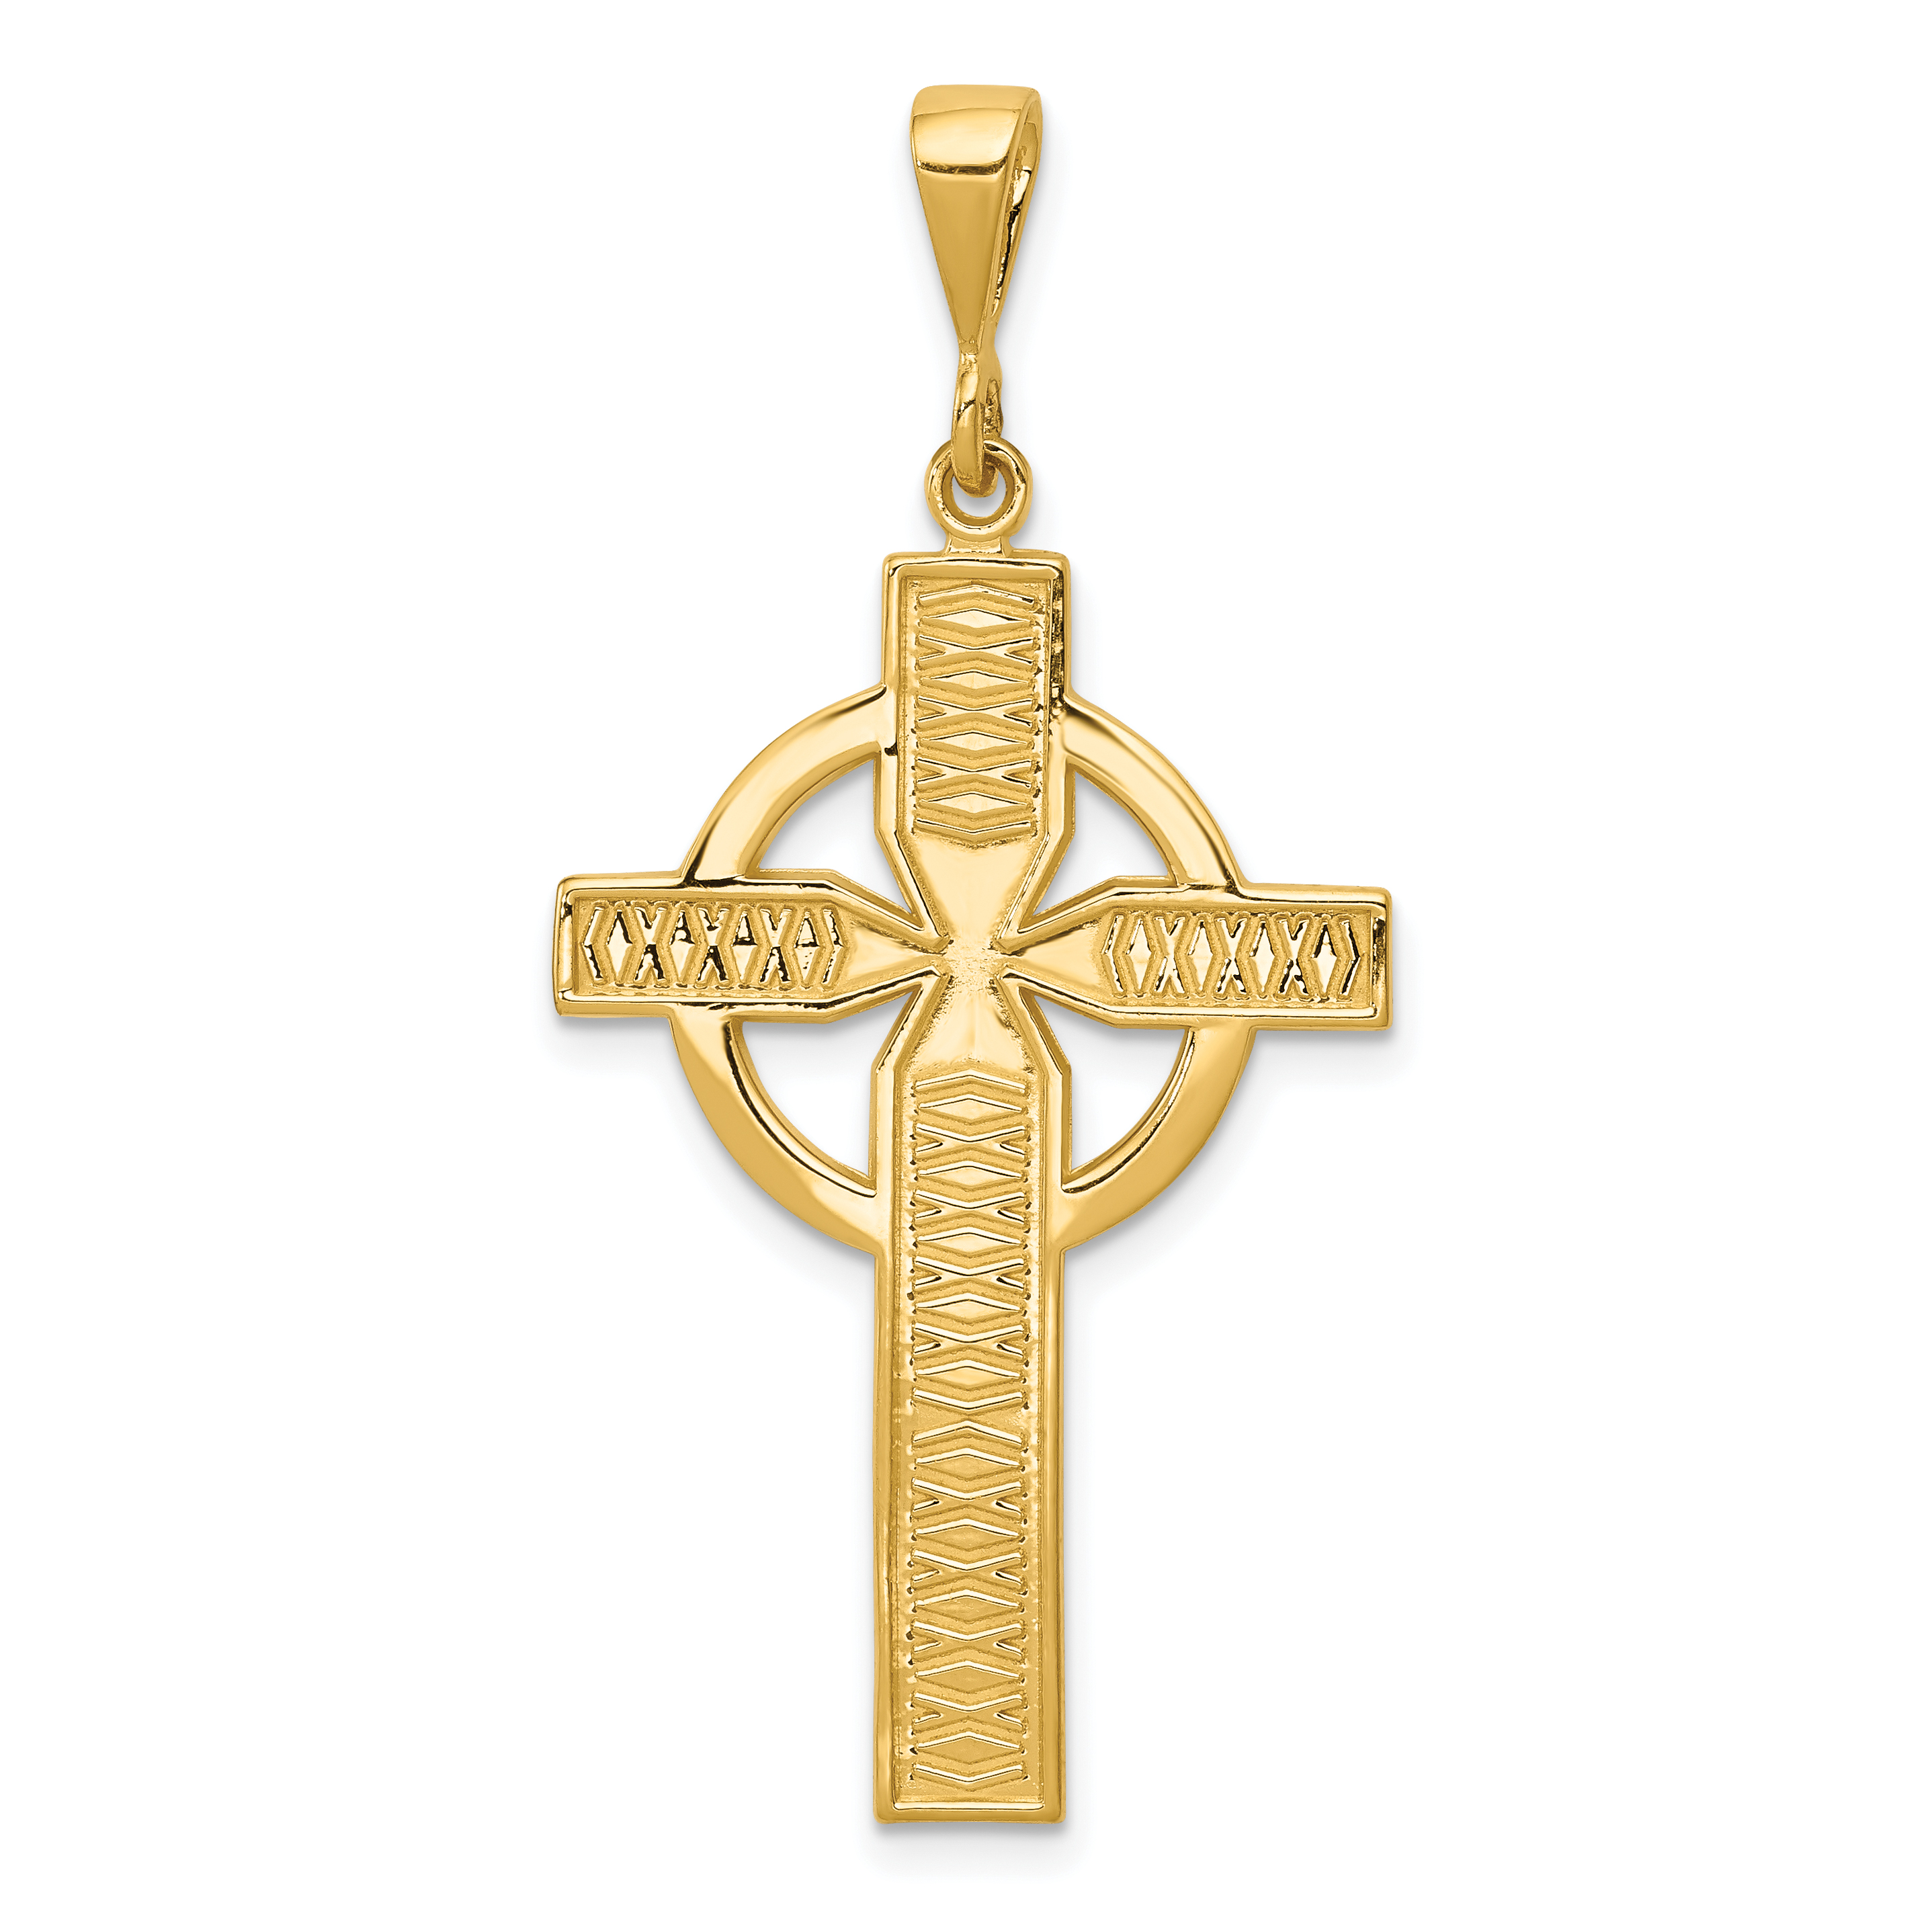 14k Celtic Cross Pendant. Weight: 2.22, Length: 46, Width: 21